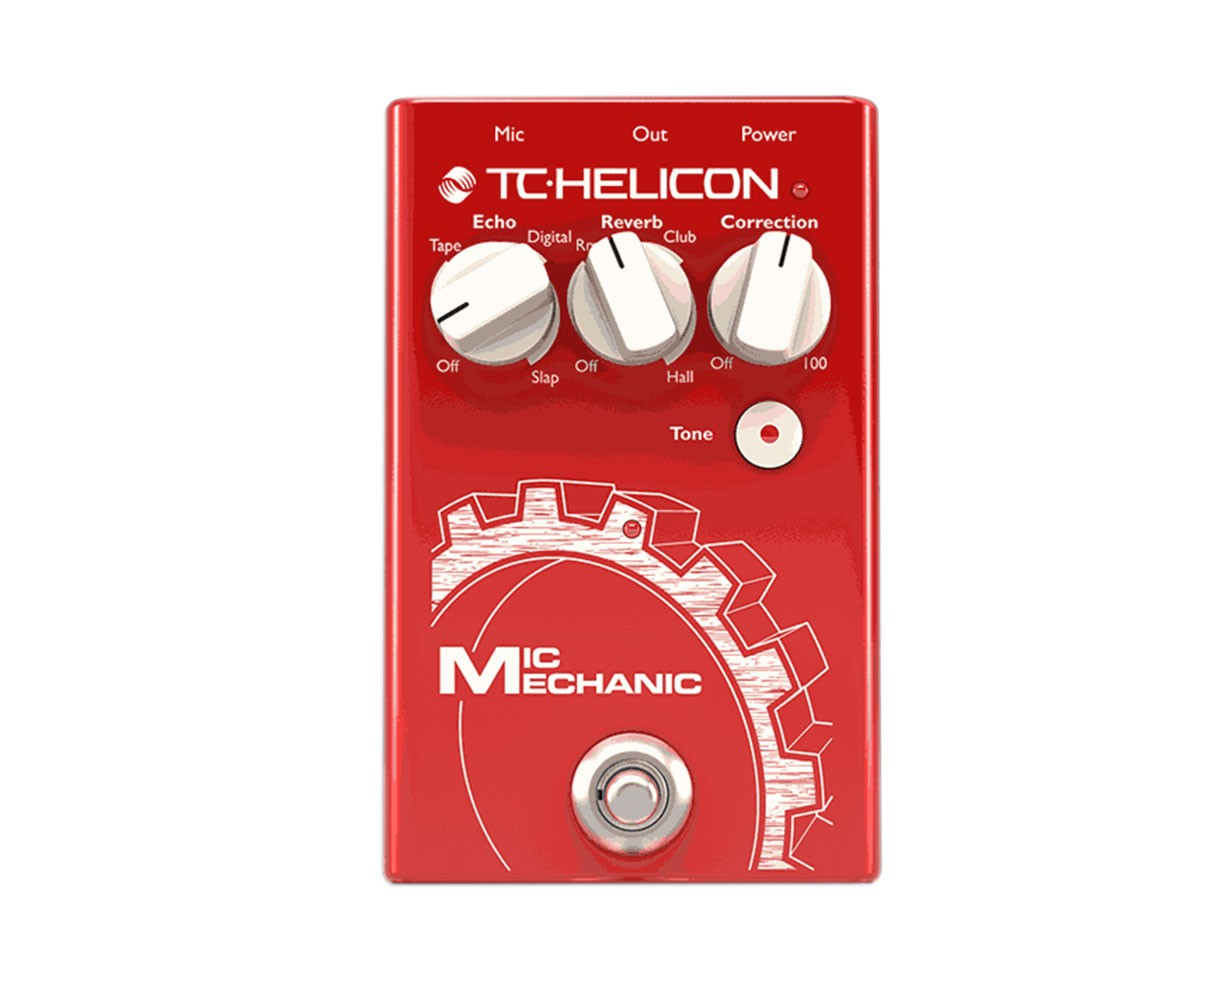 TC Helicon Mic Mechanic 2 - Used